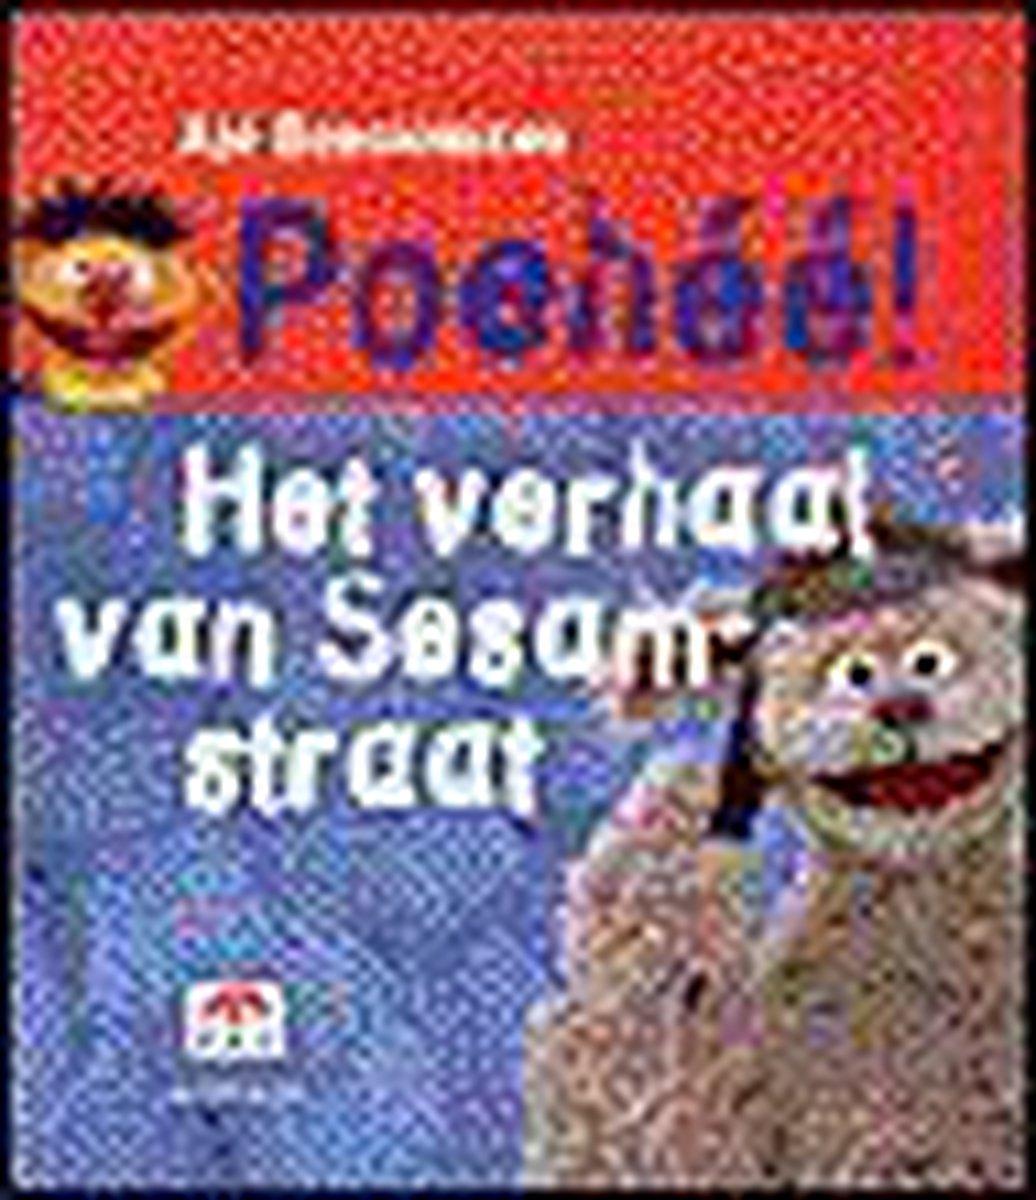 Poehee! - Het verhaal van Sesamstraat